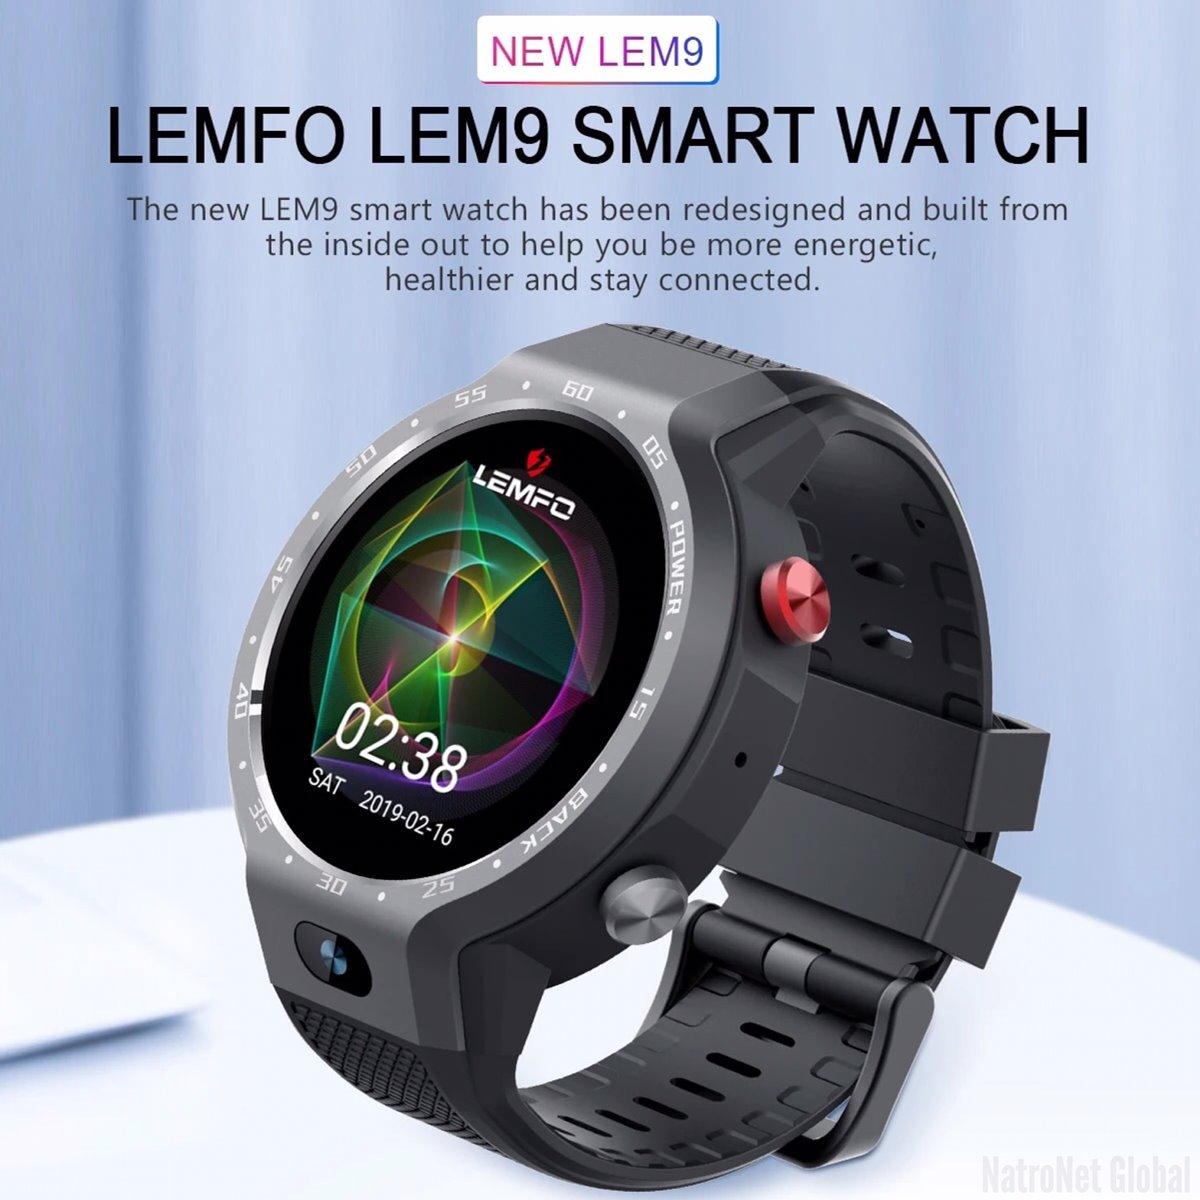 LEMFO LEM9 - Çift Sistemli Akıllı Saat 4G LTE Telefon Android 7.1.1 1GB + 16GB 1.39 inç Ekran 5MP Ön Kamera 600Mah Pil